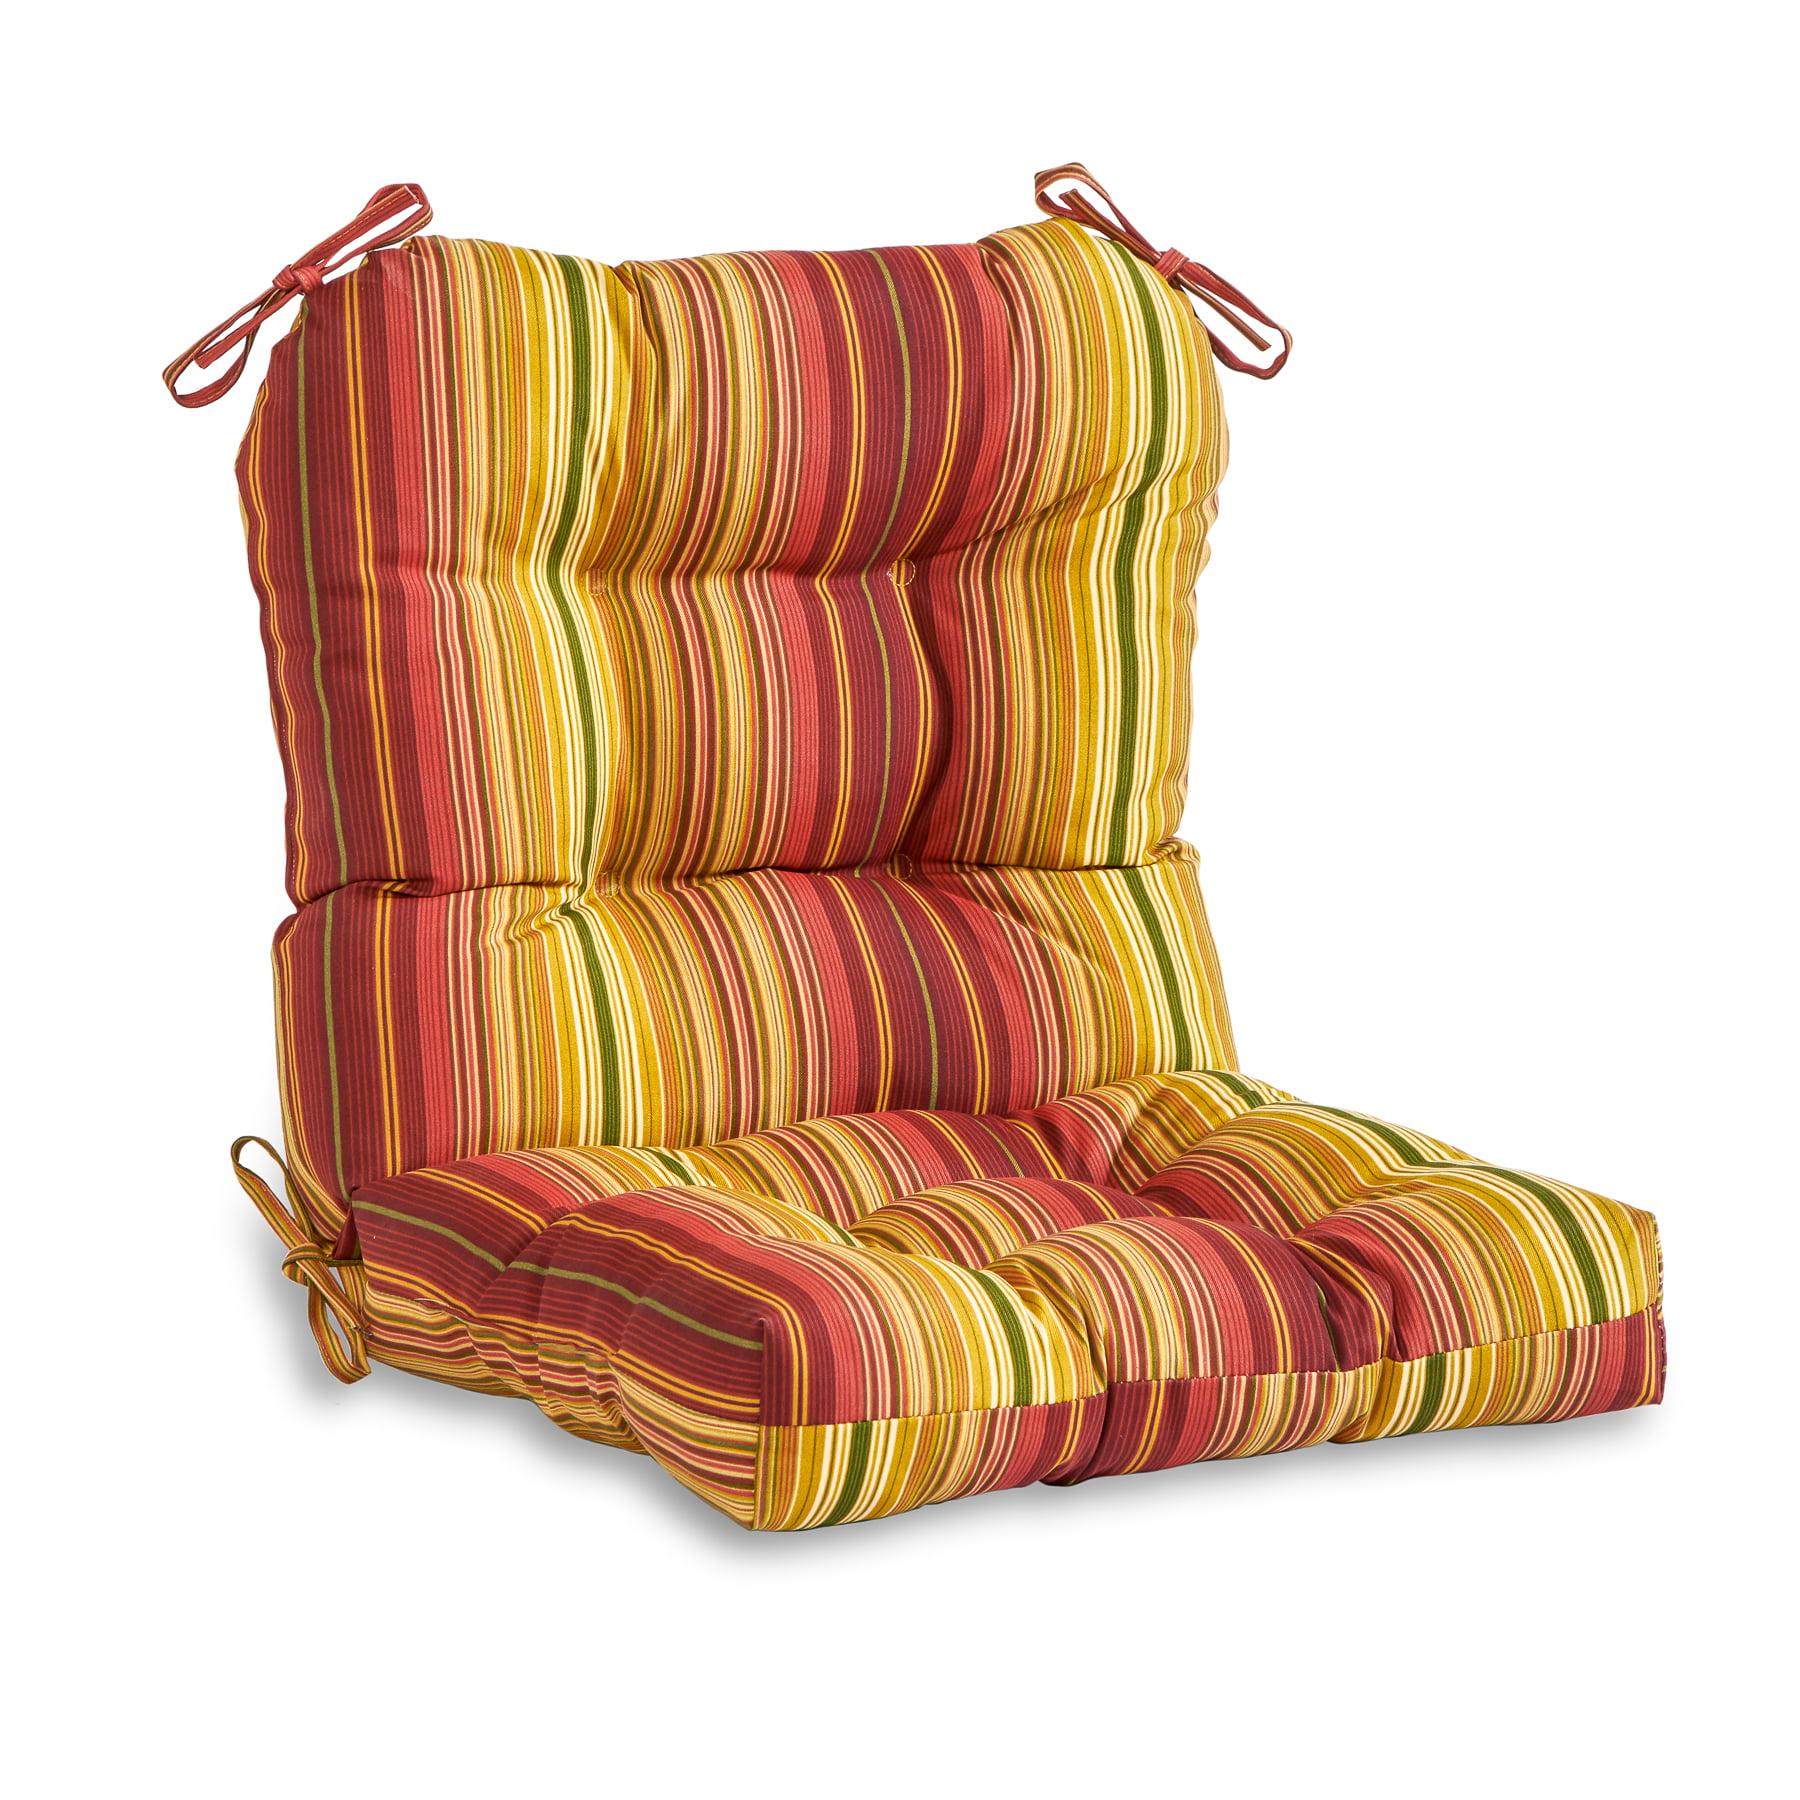 Greendale Home Fashions Kinnabari Outdoor Seat/Back Combo Cushion